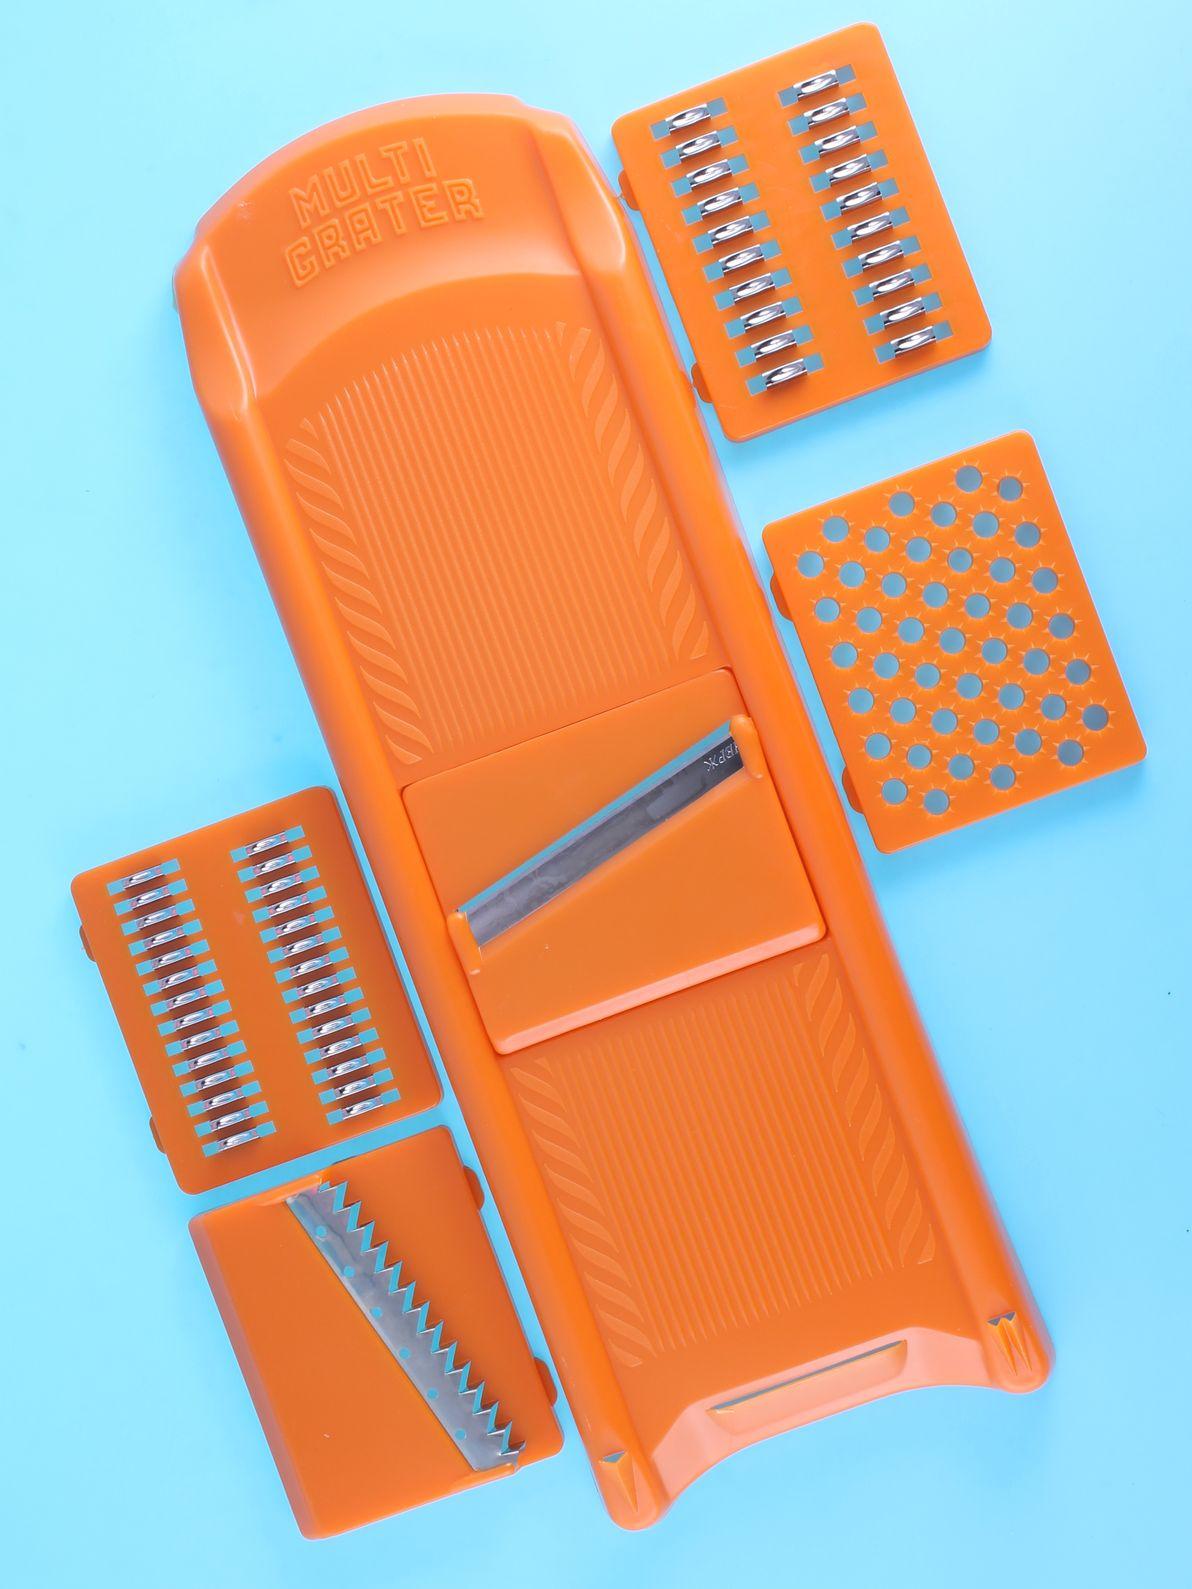 Фрукто-овощерезка Выручалочка Овощерезка, 7426845739593, оранжевый